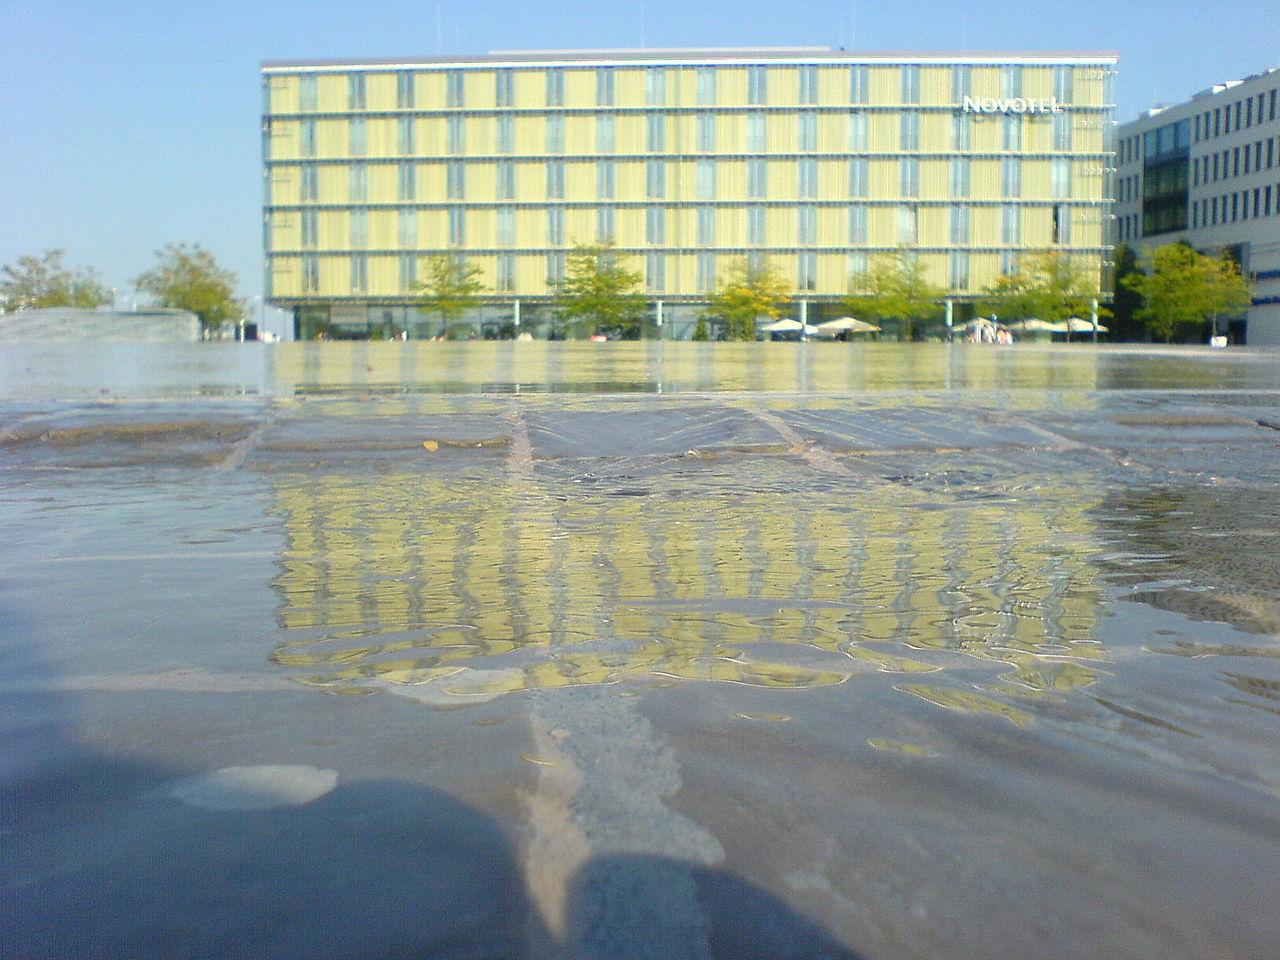 Hotel Novotel Muenchen City M Ef Bf Bdnchen